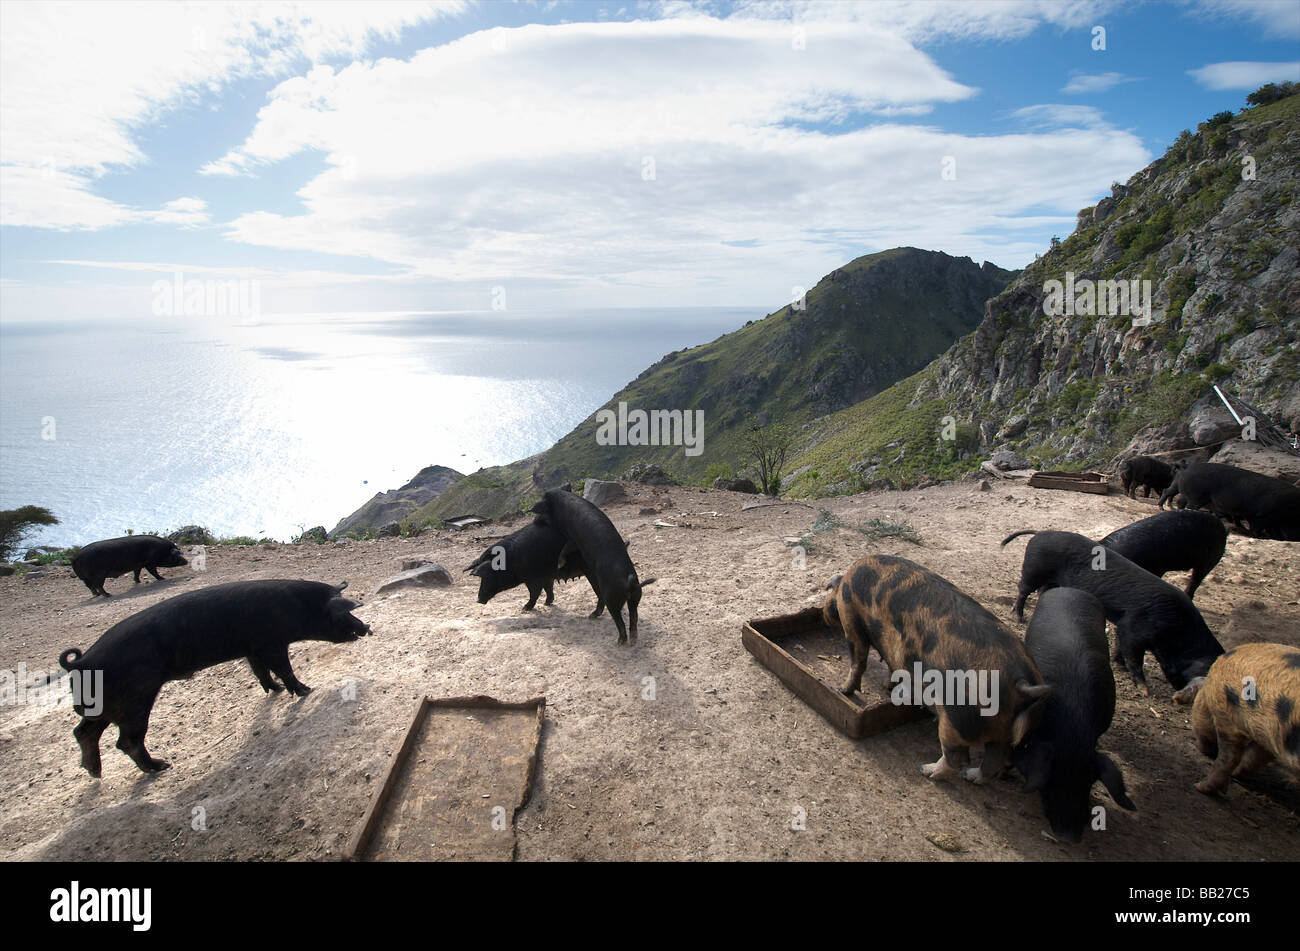 agriculture animal antillen antilles bovenwinden bovenwindse caribbean day daytime dutch eiland eilanden farm farming - Stock Image